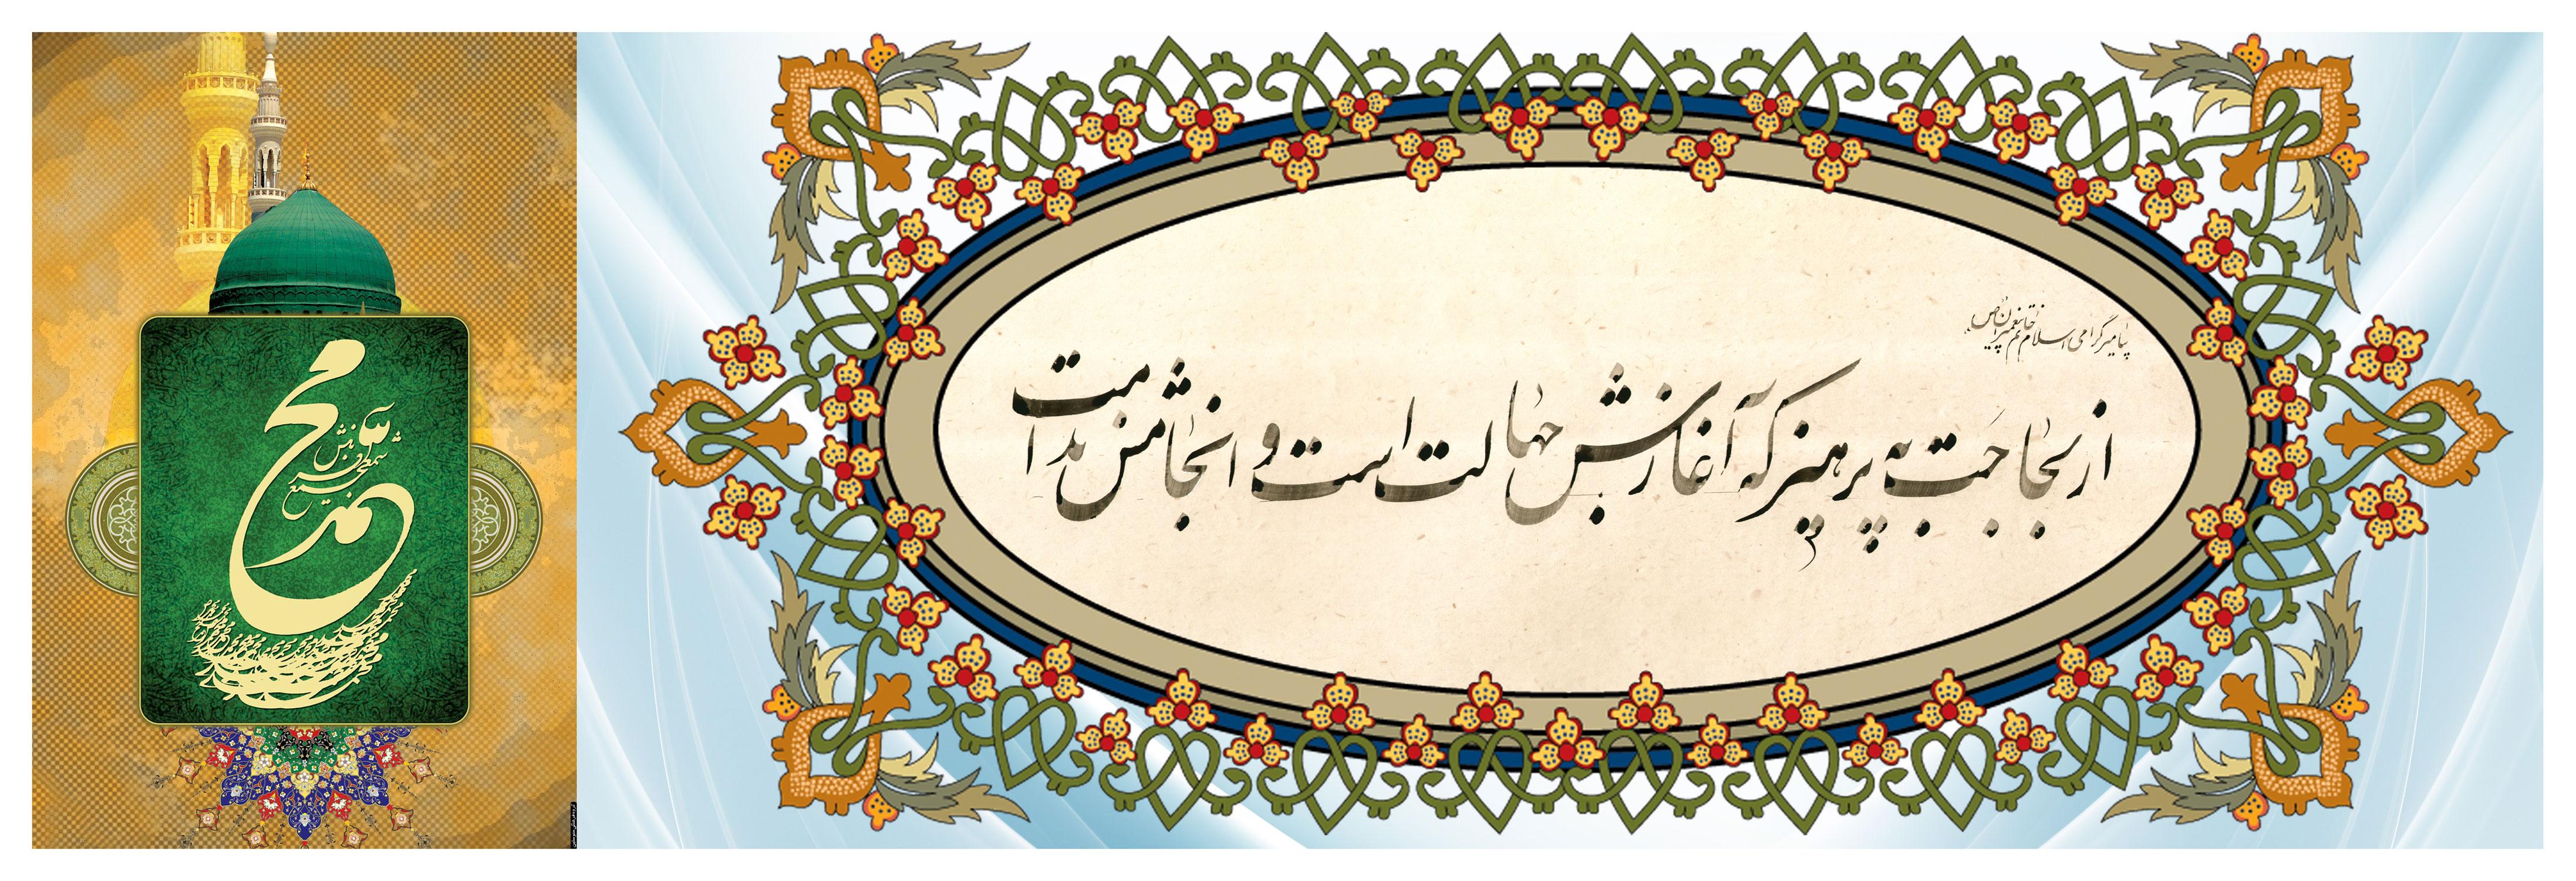 عکس تولد پیامبر اکرم (ص)